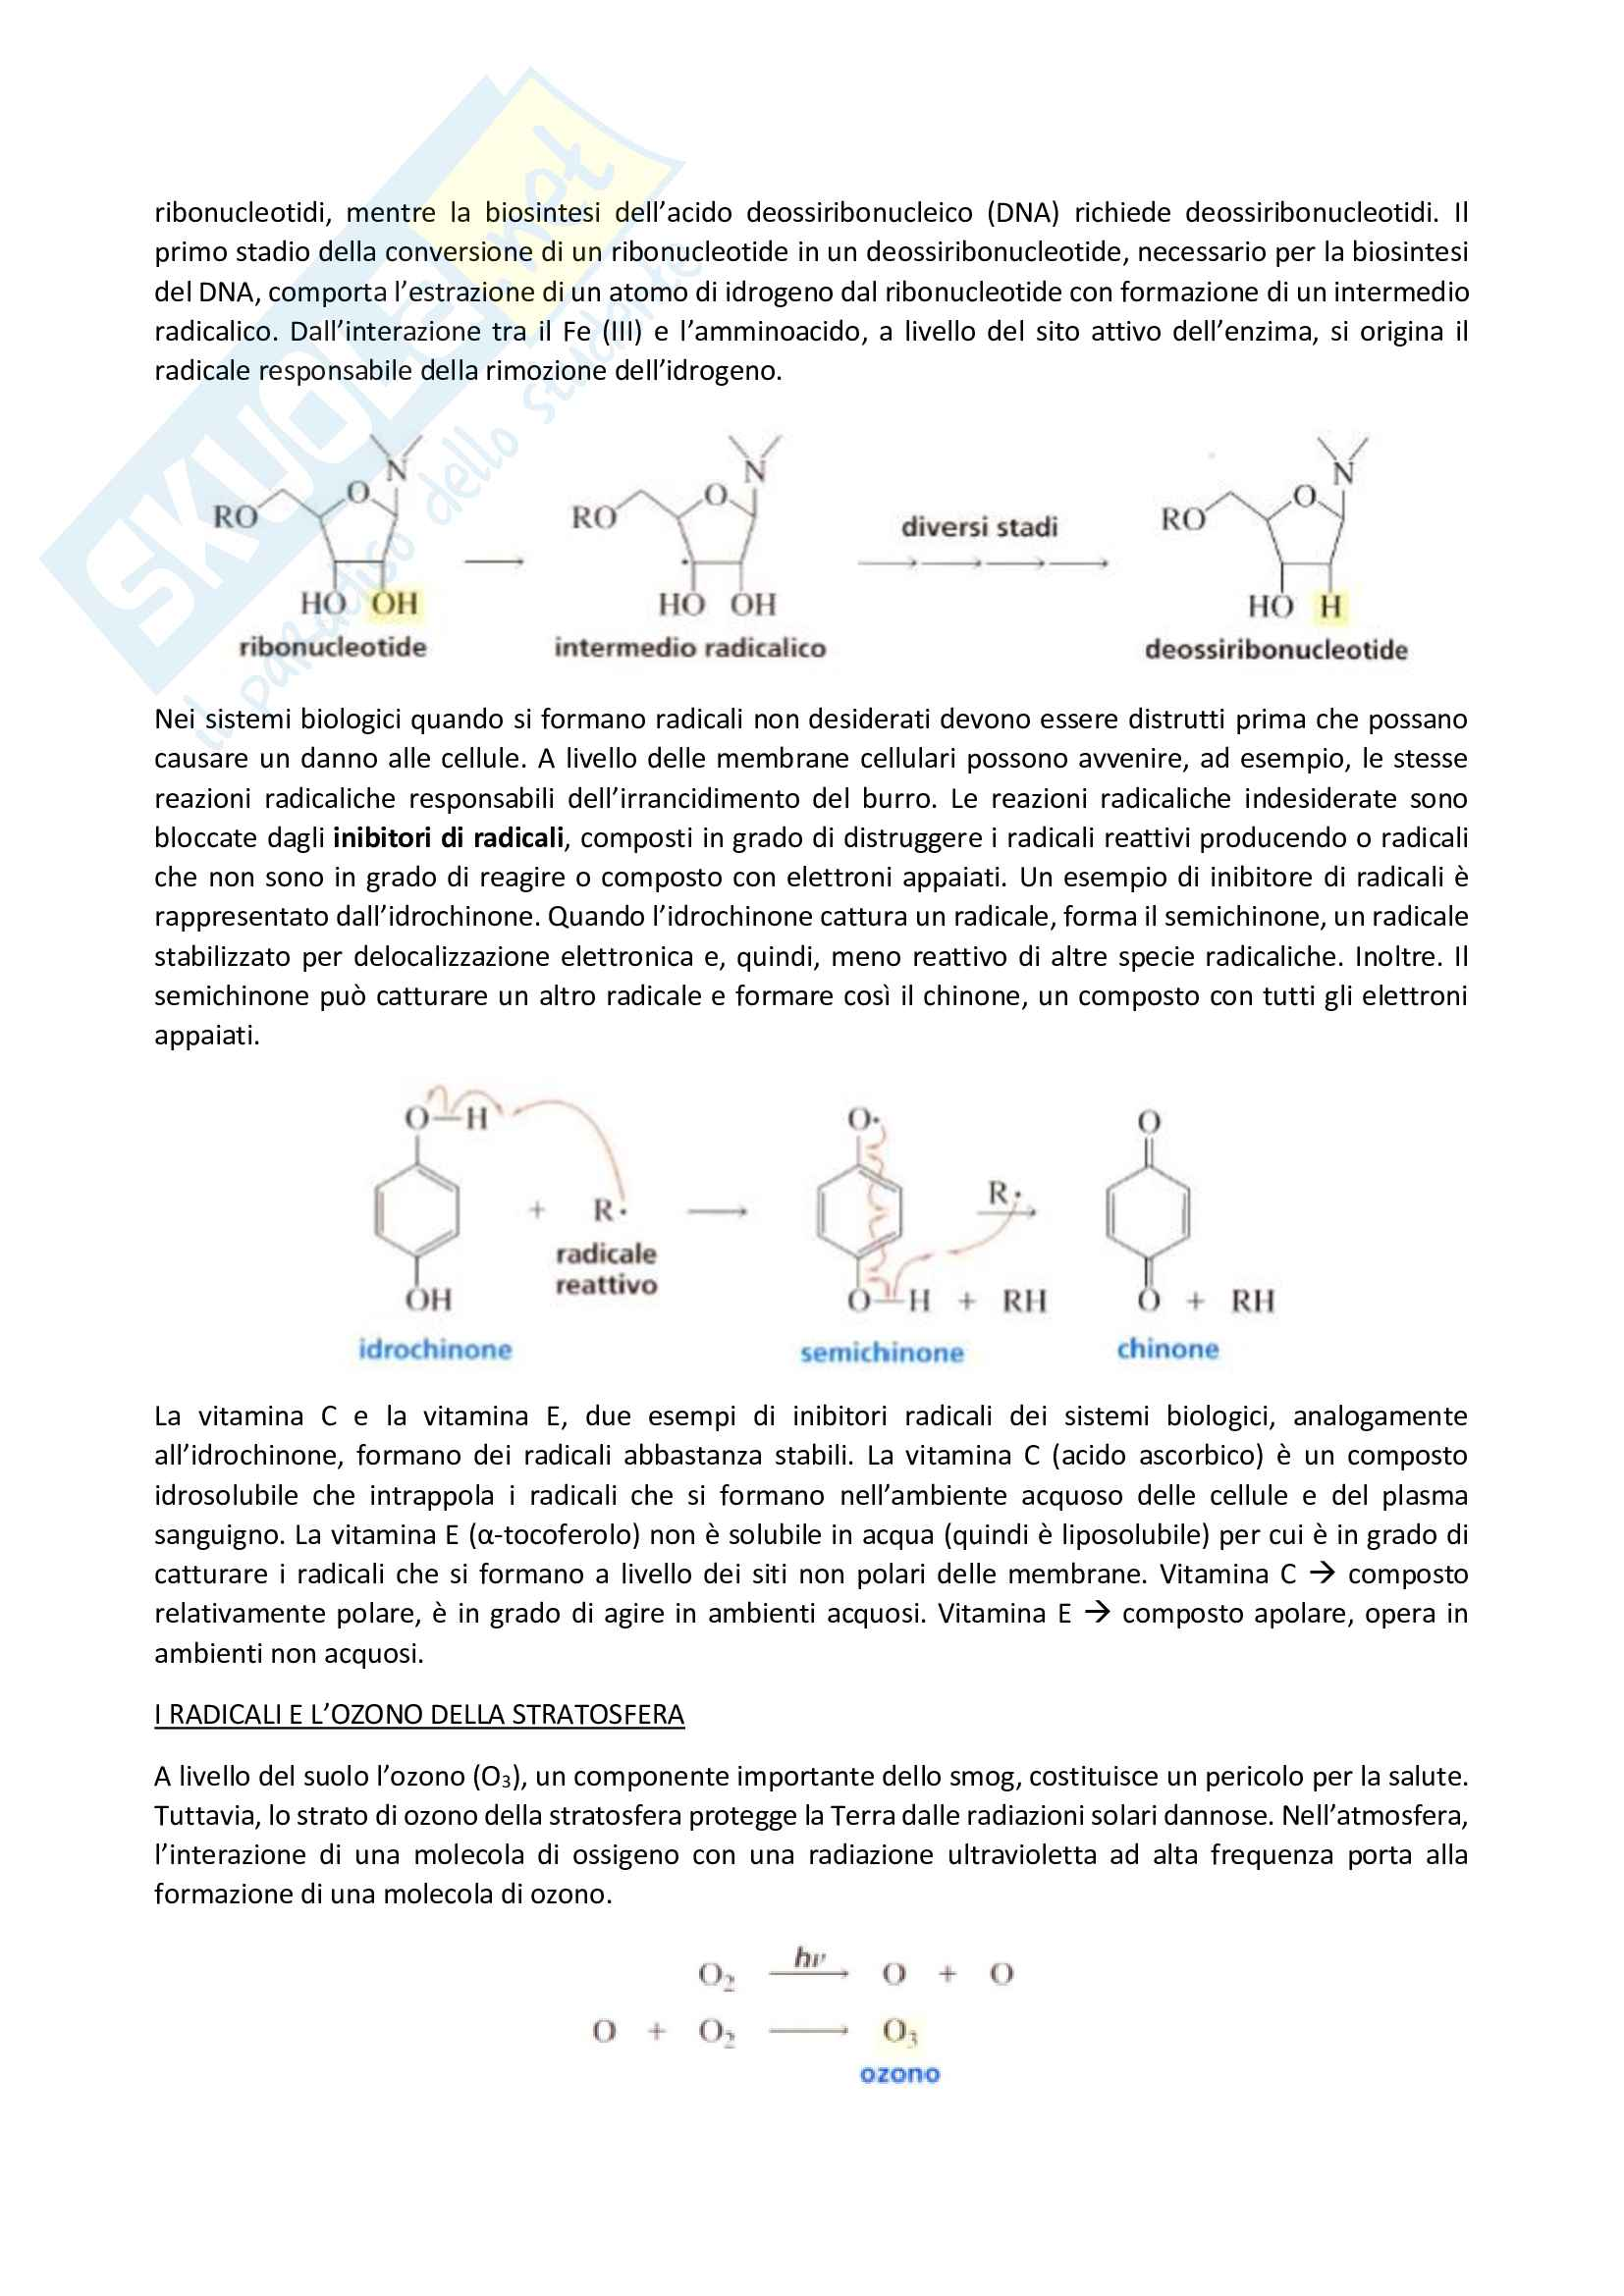 Chimica organica, Reazioni degli alcani - I radicali Pag. 11